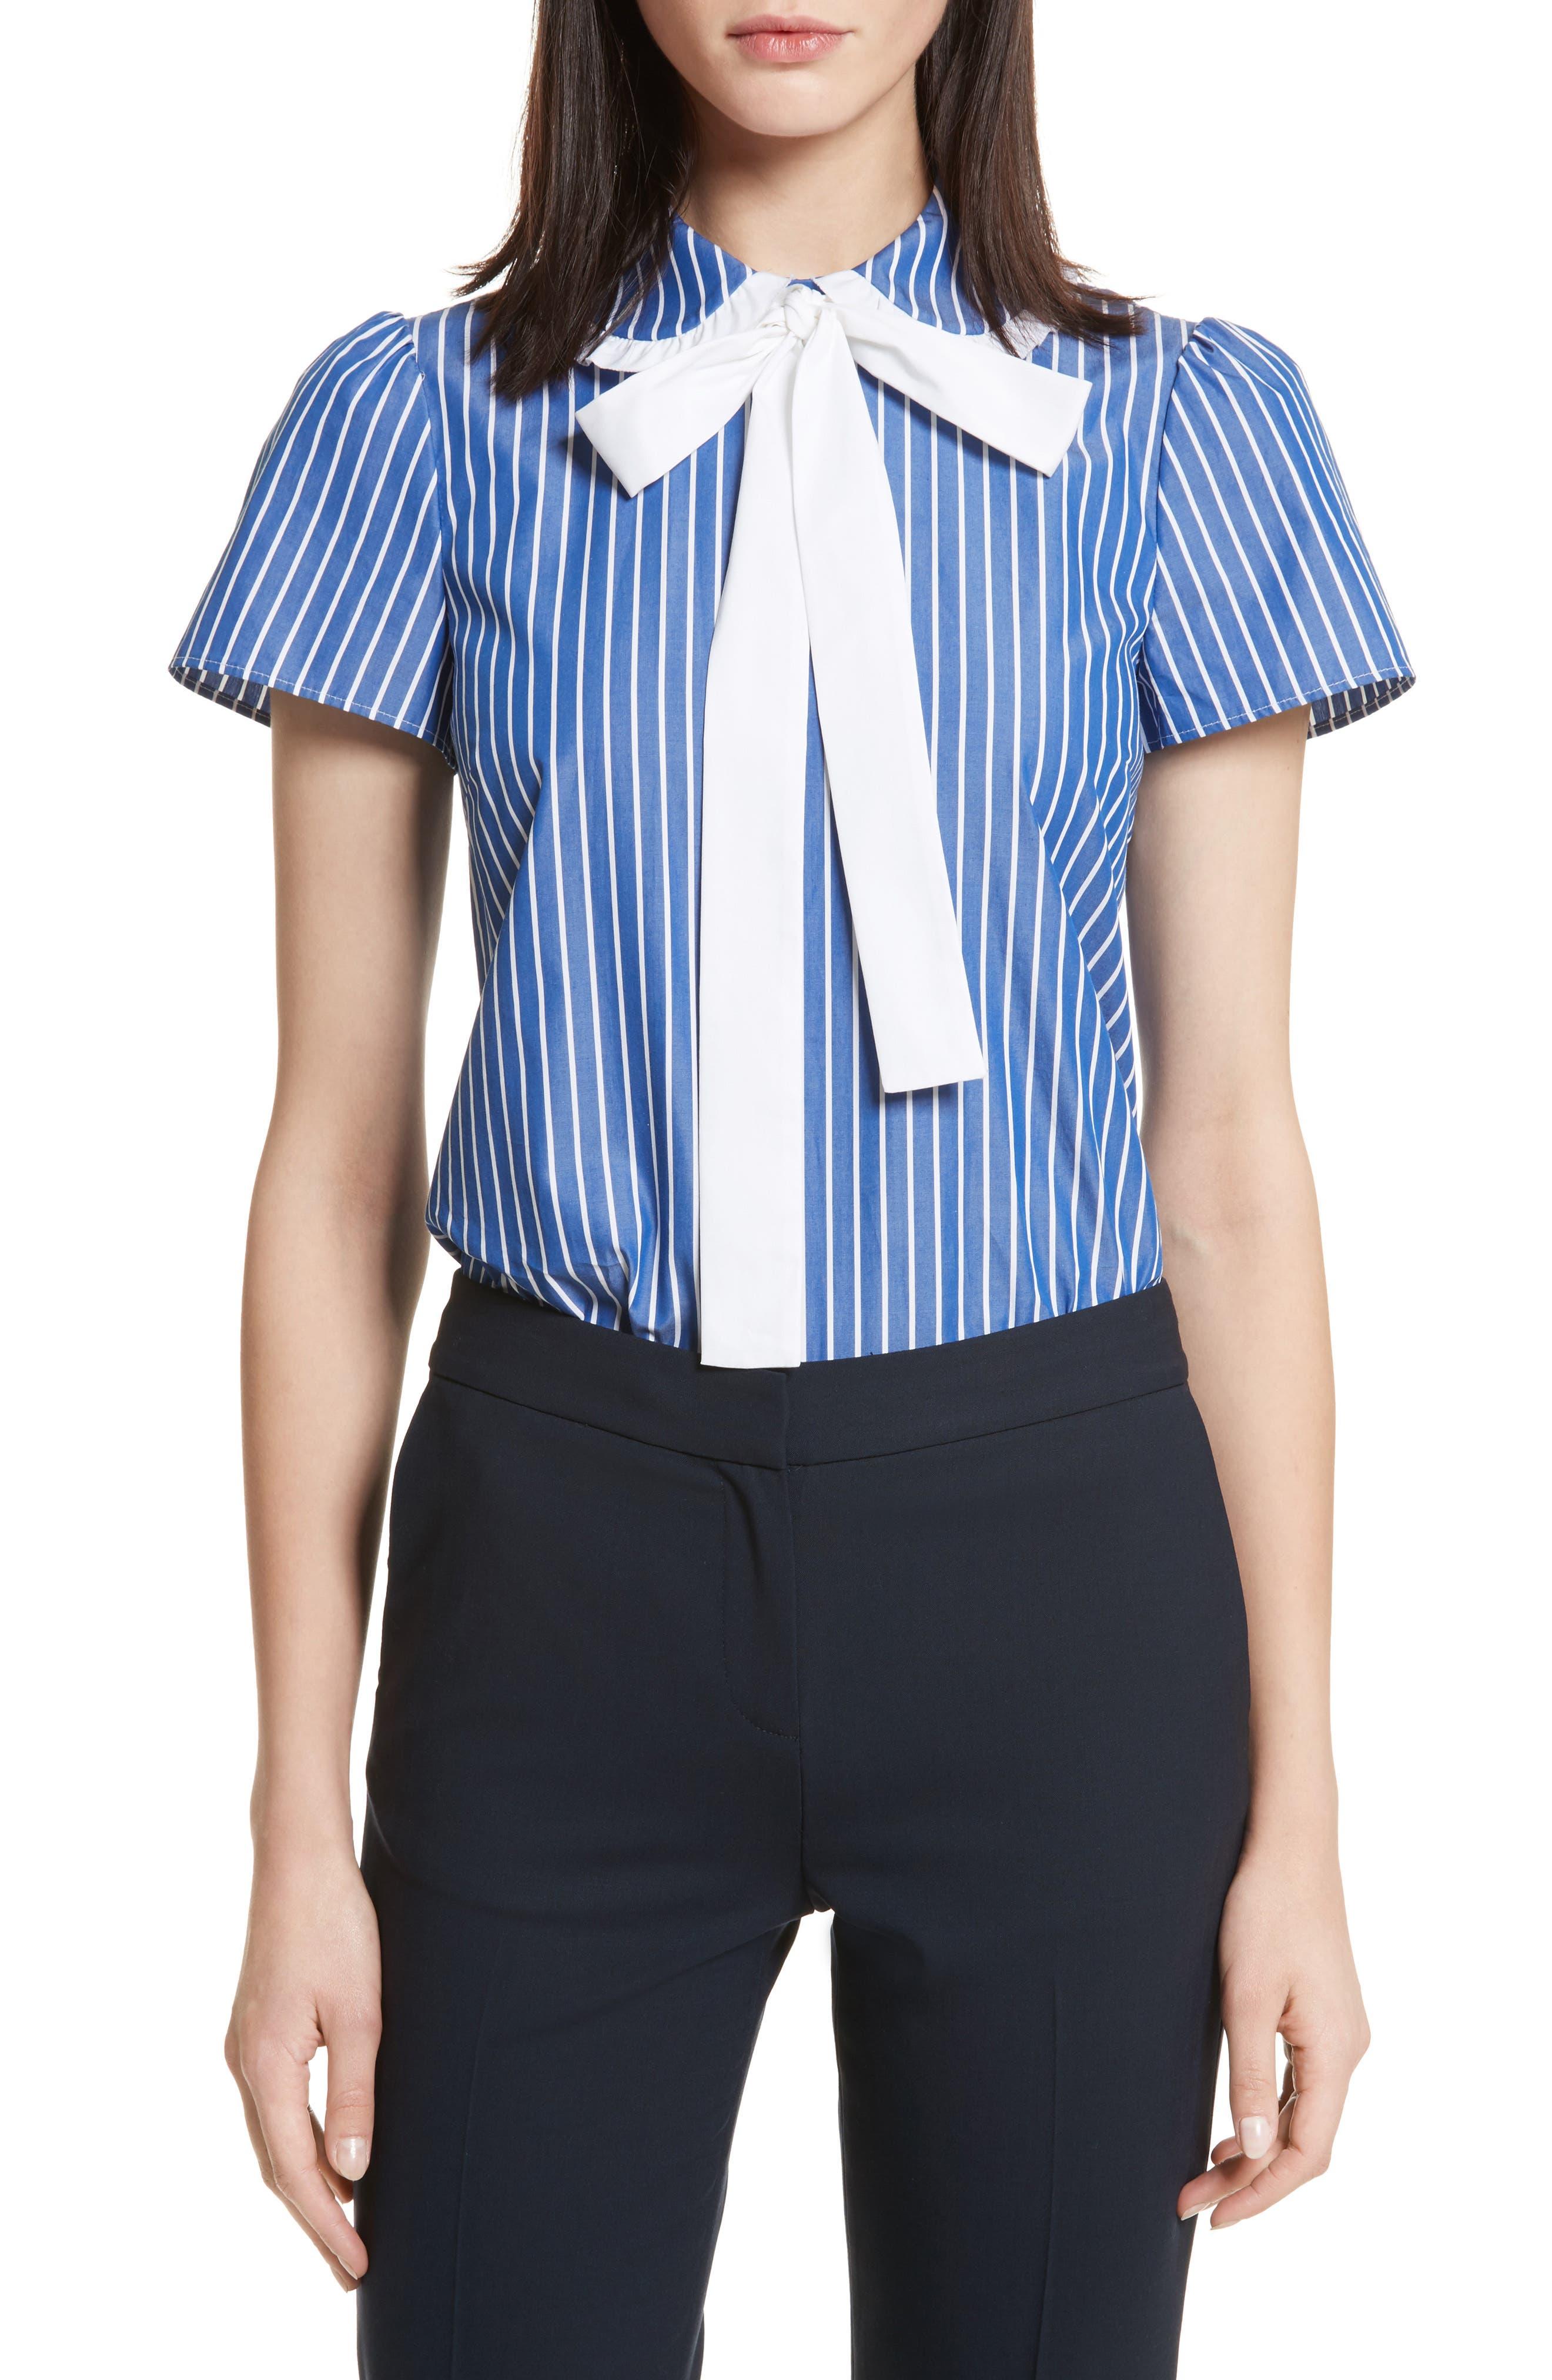 Main Image - RED Valentino Tie Neck Stripe Cotton Poplin Top